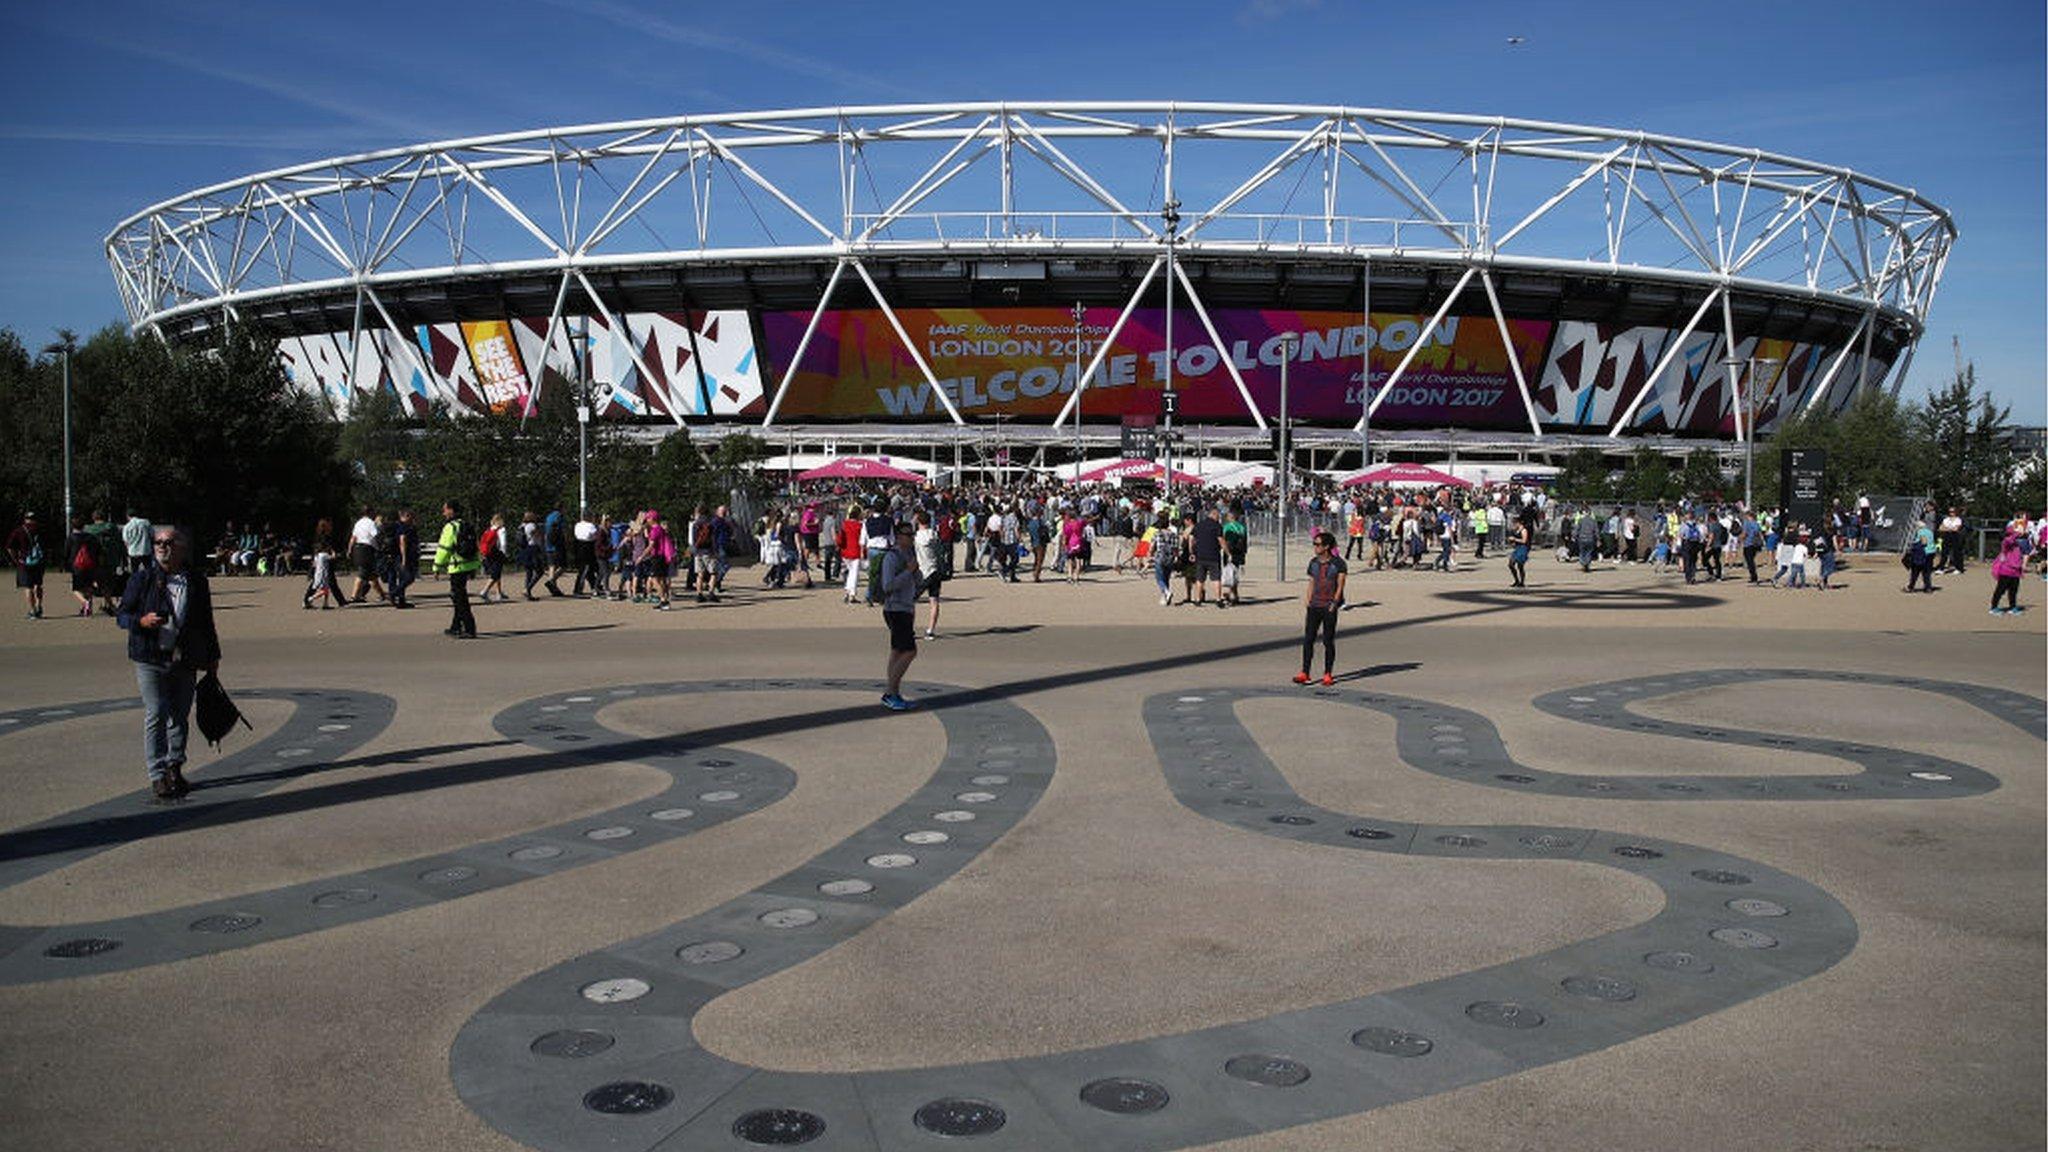 London 2012 legacy generates more than £130m